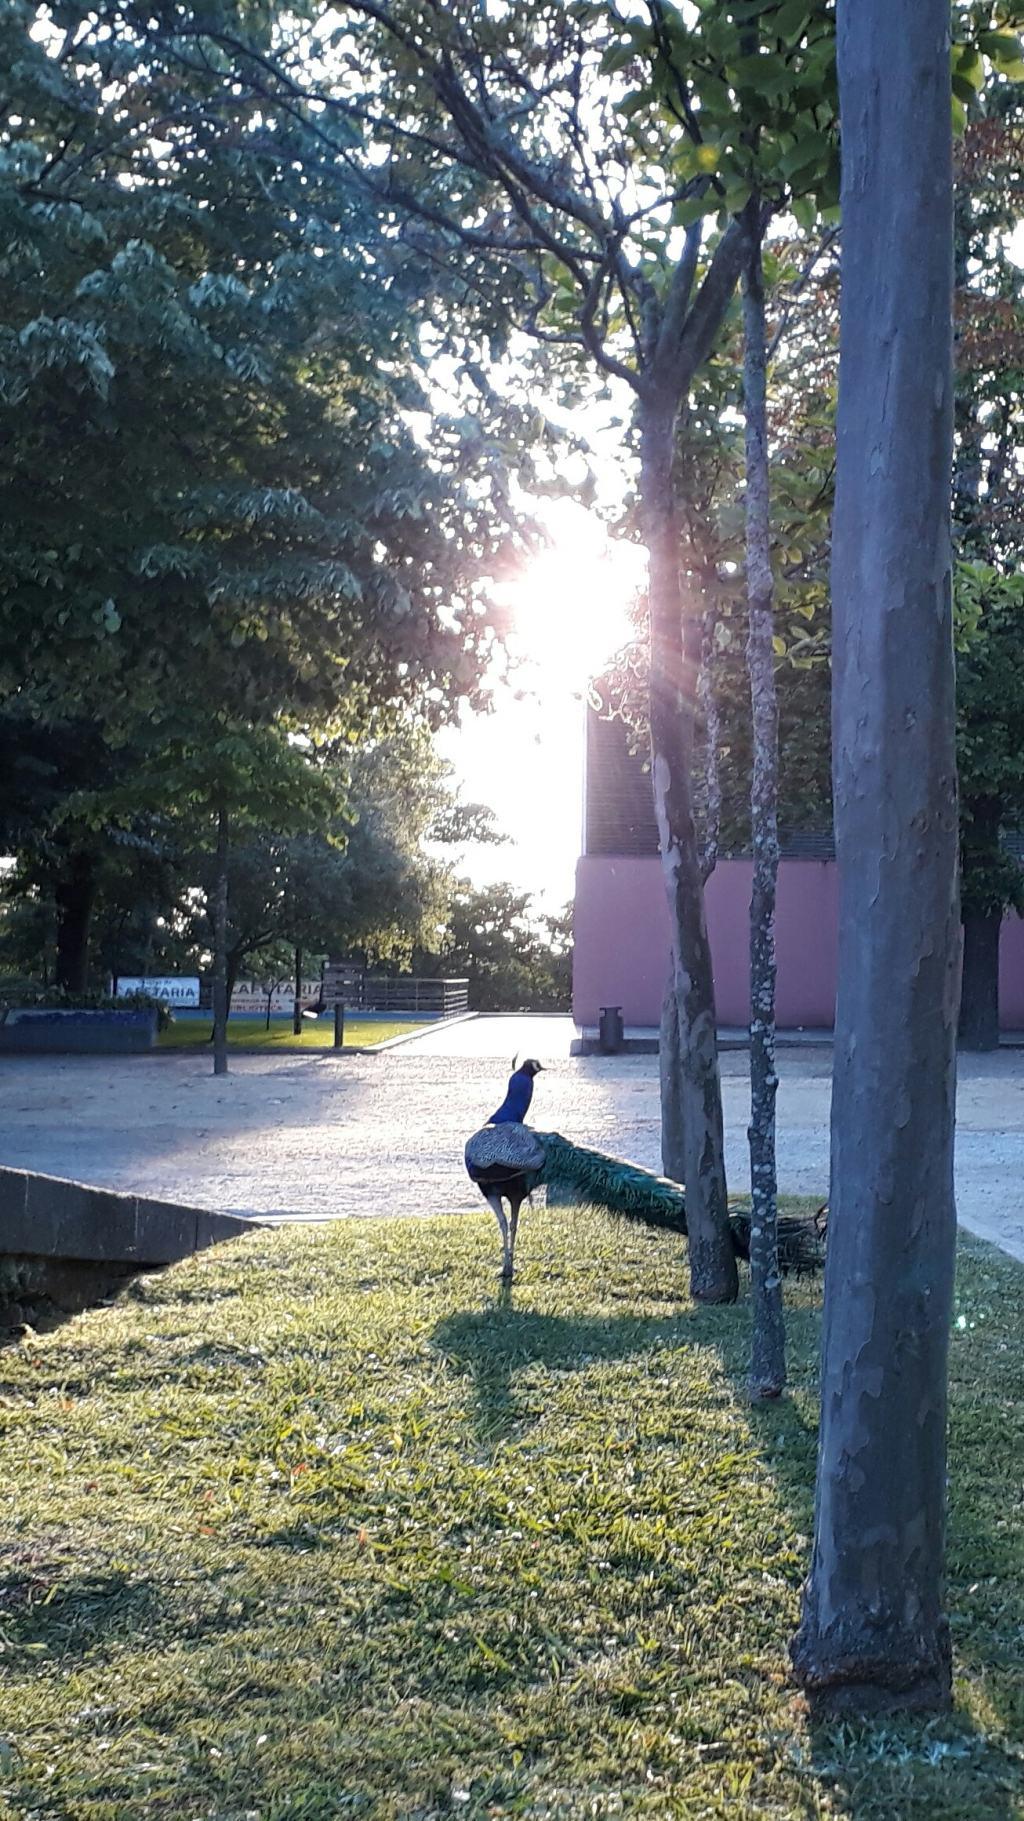 Peacock in the Jardins do Palácio de Cristal